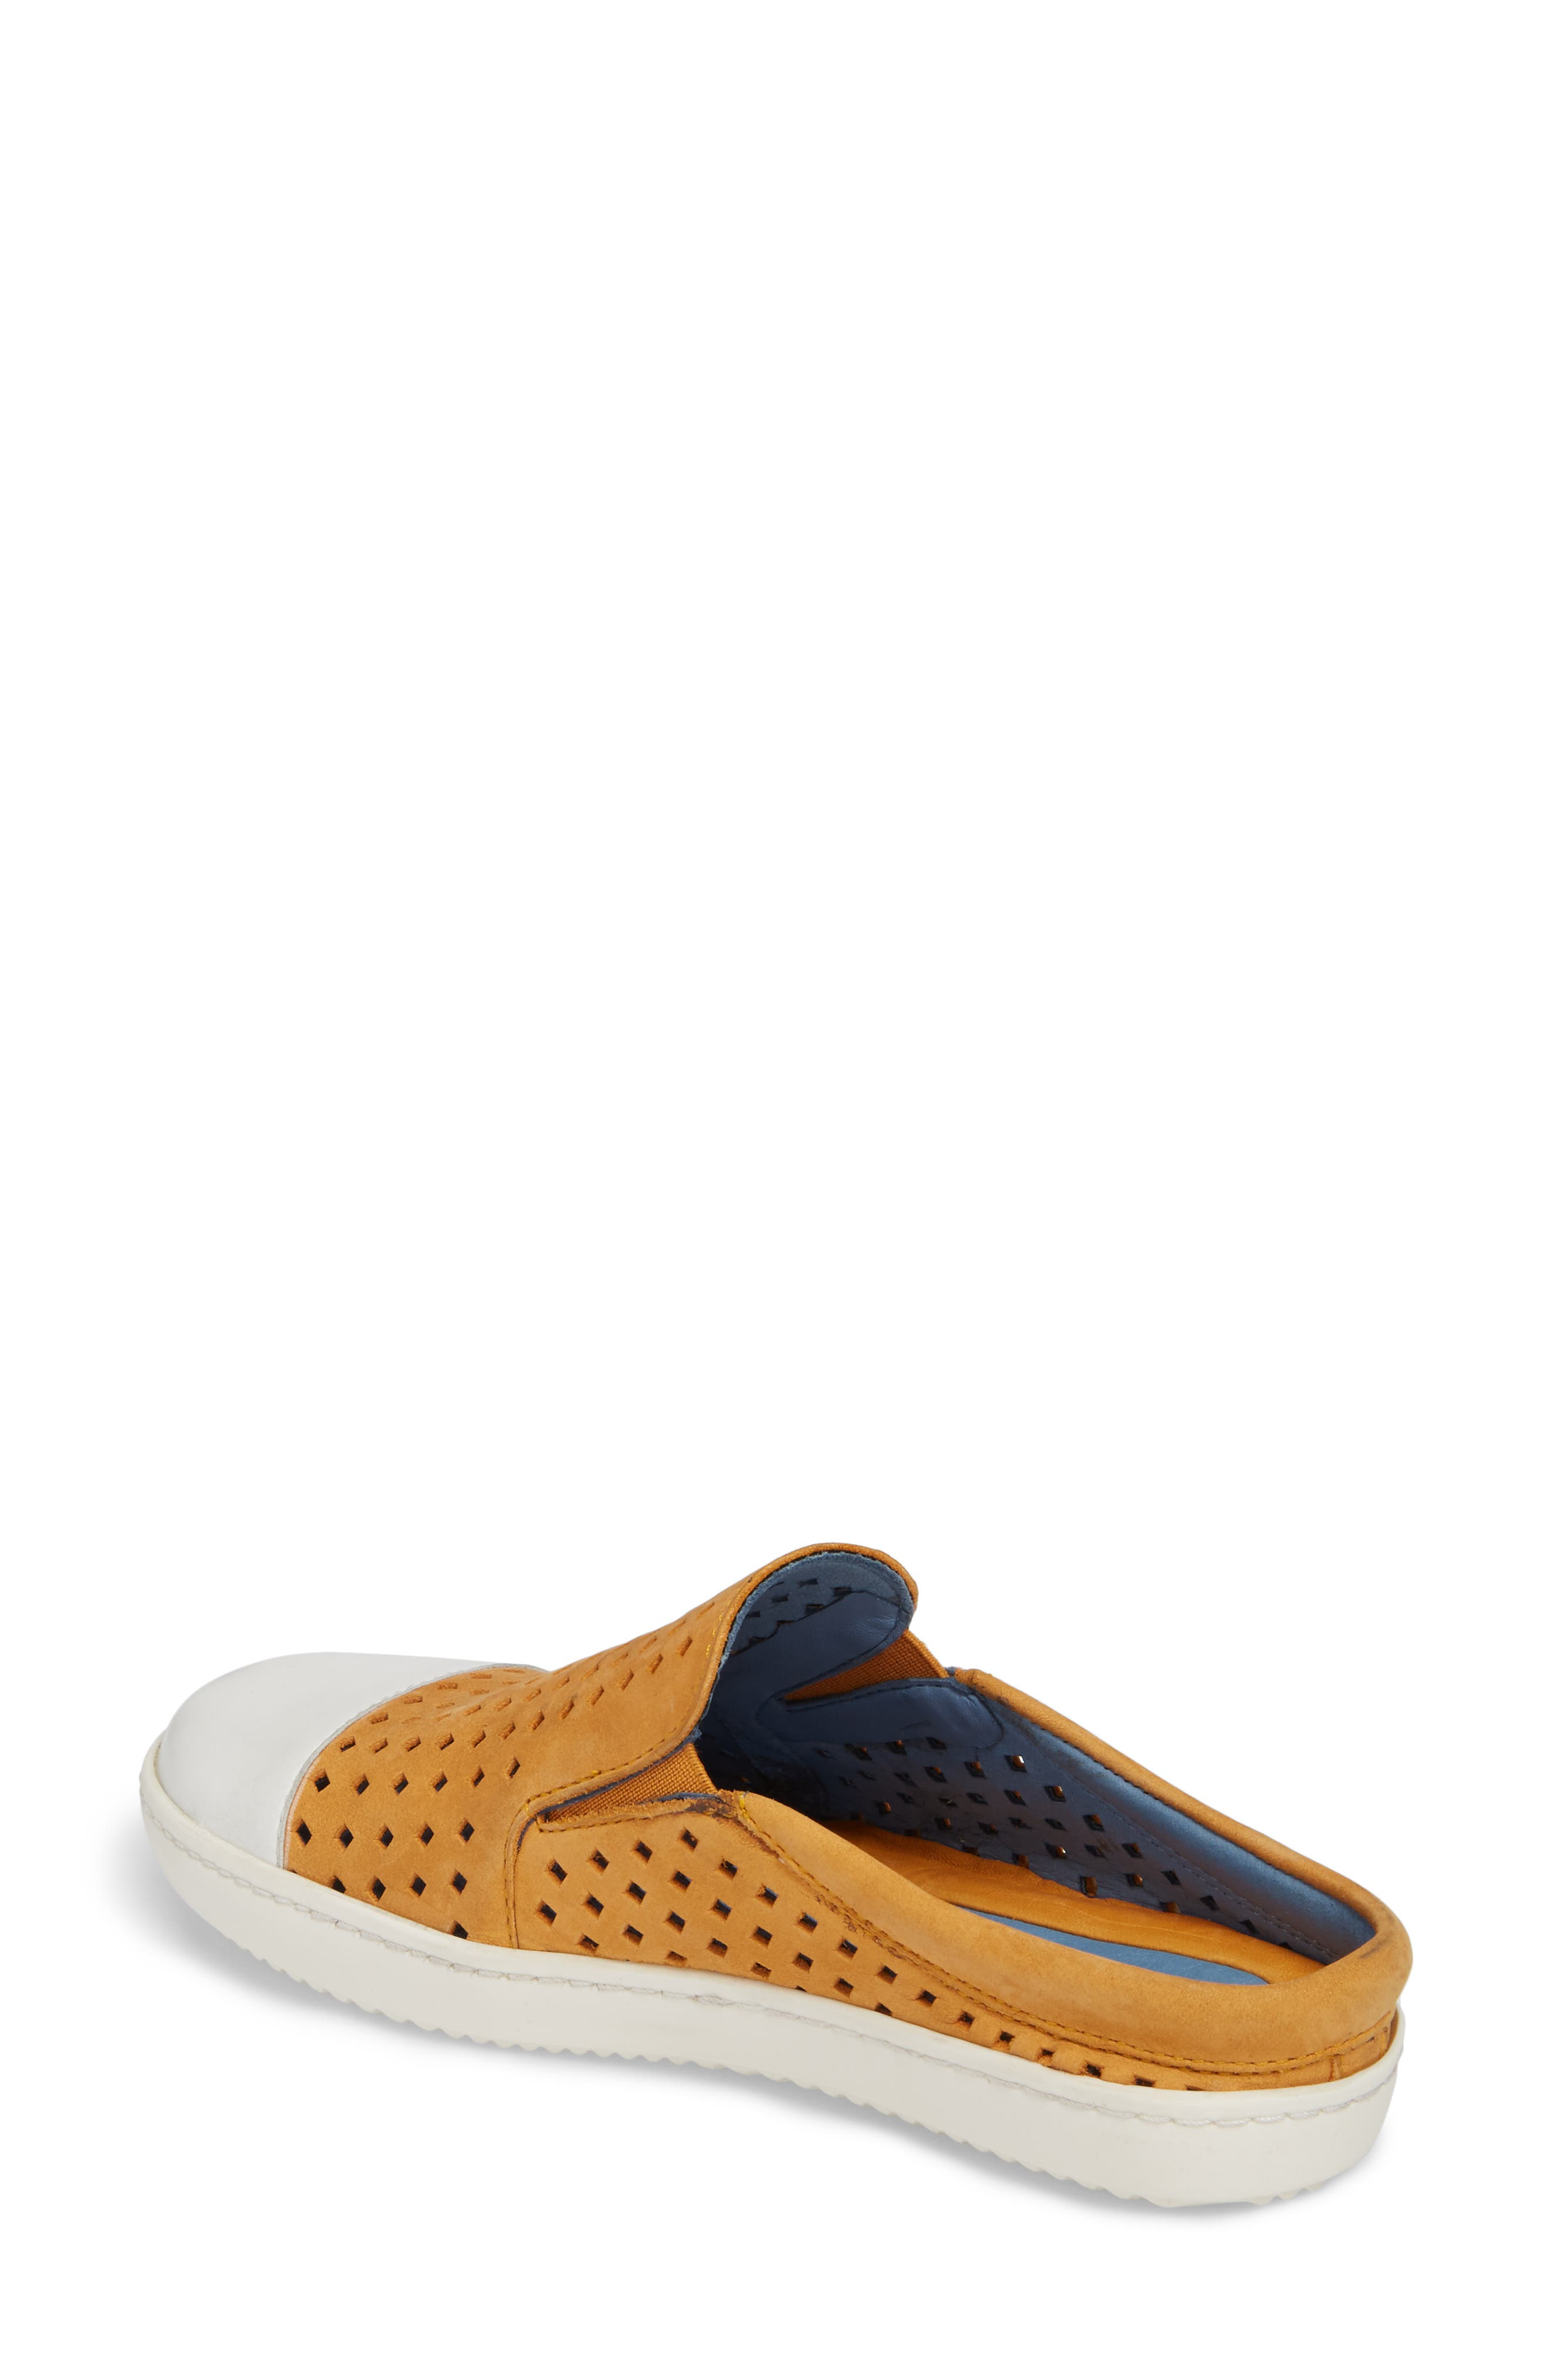 Tippy Slip-On Sneaker,                             Alternate thumbnail 2, color,                             Saffon Suede